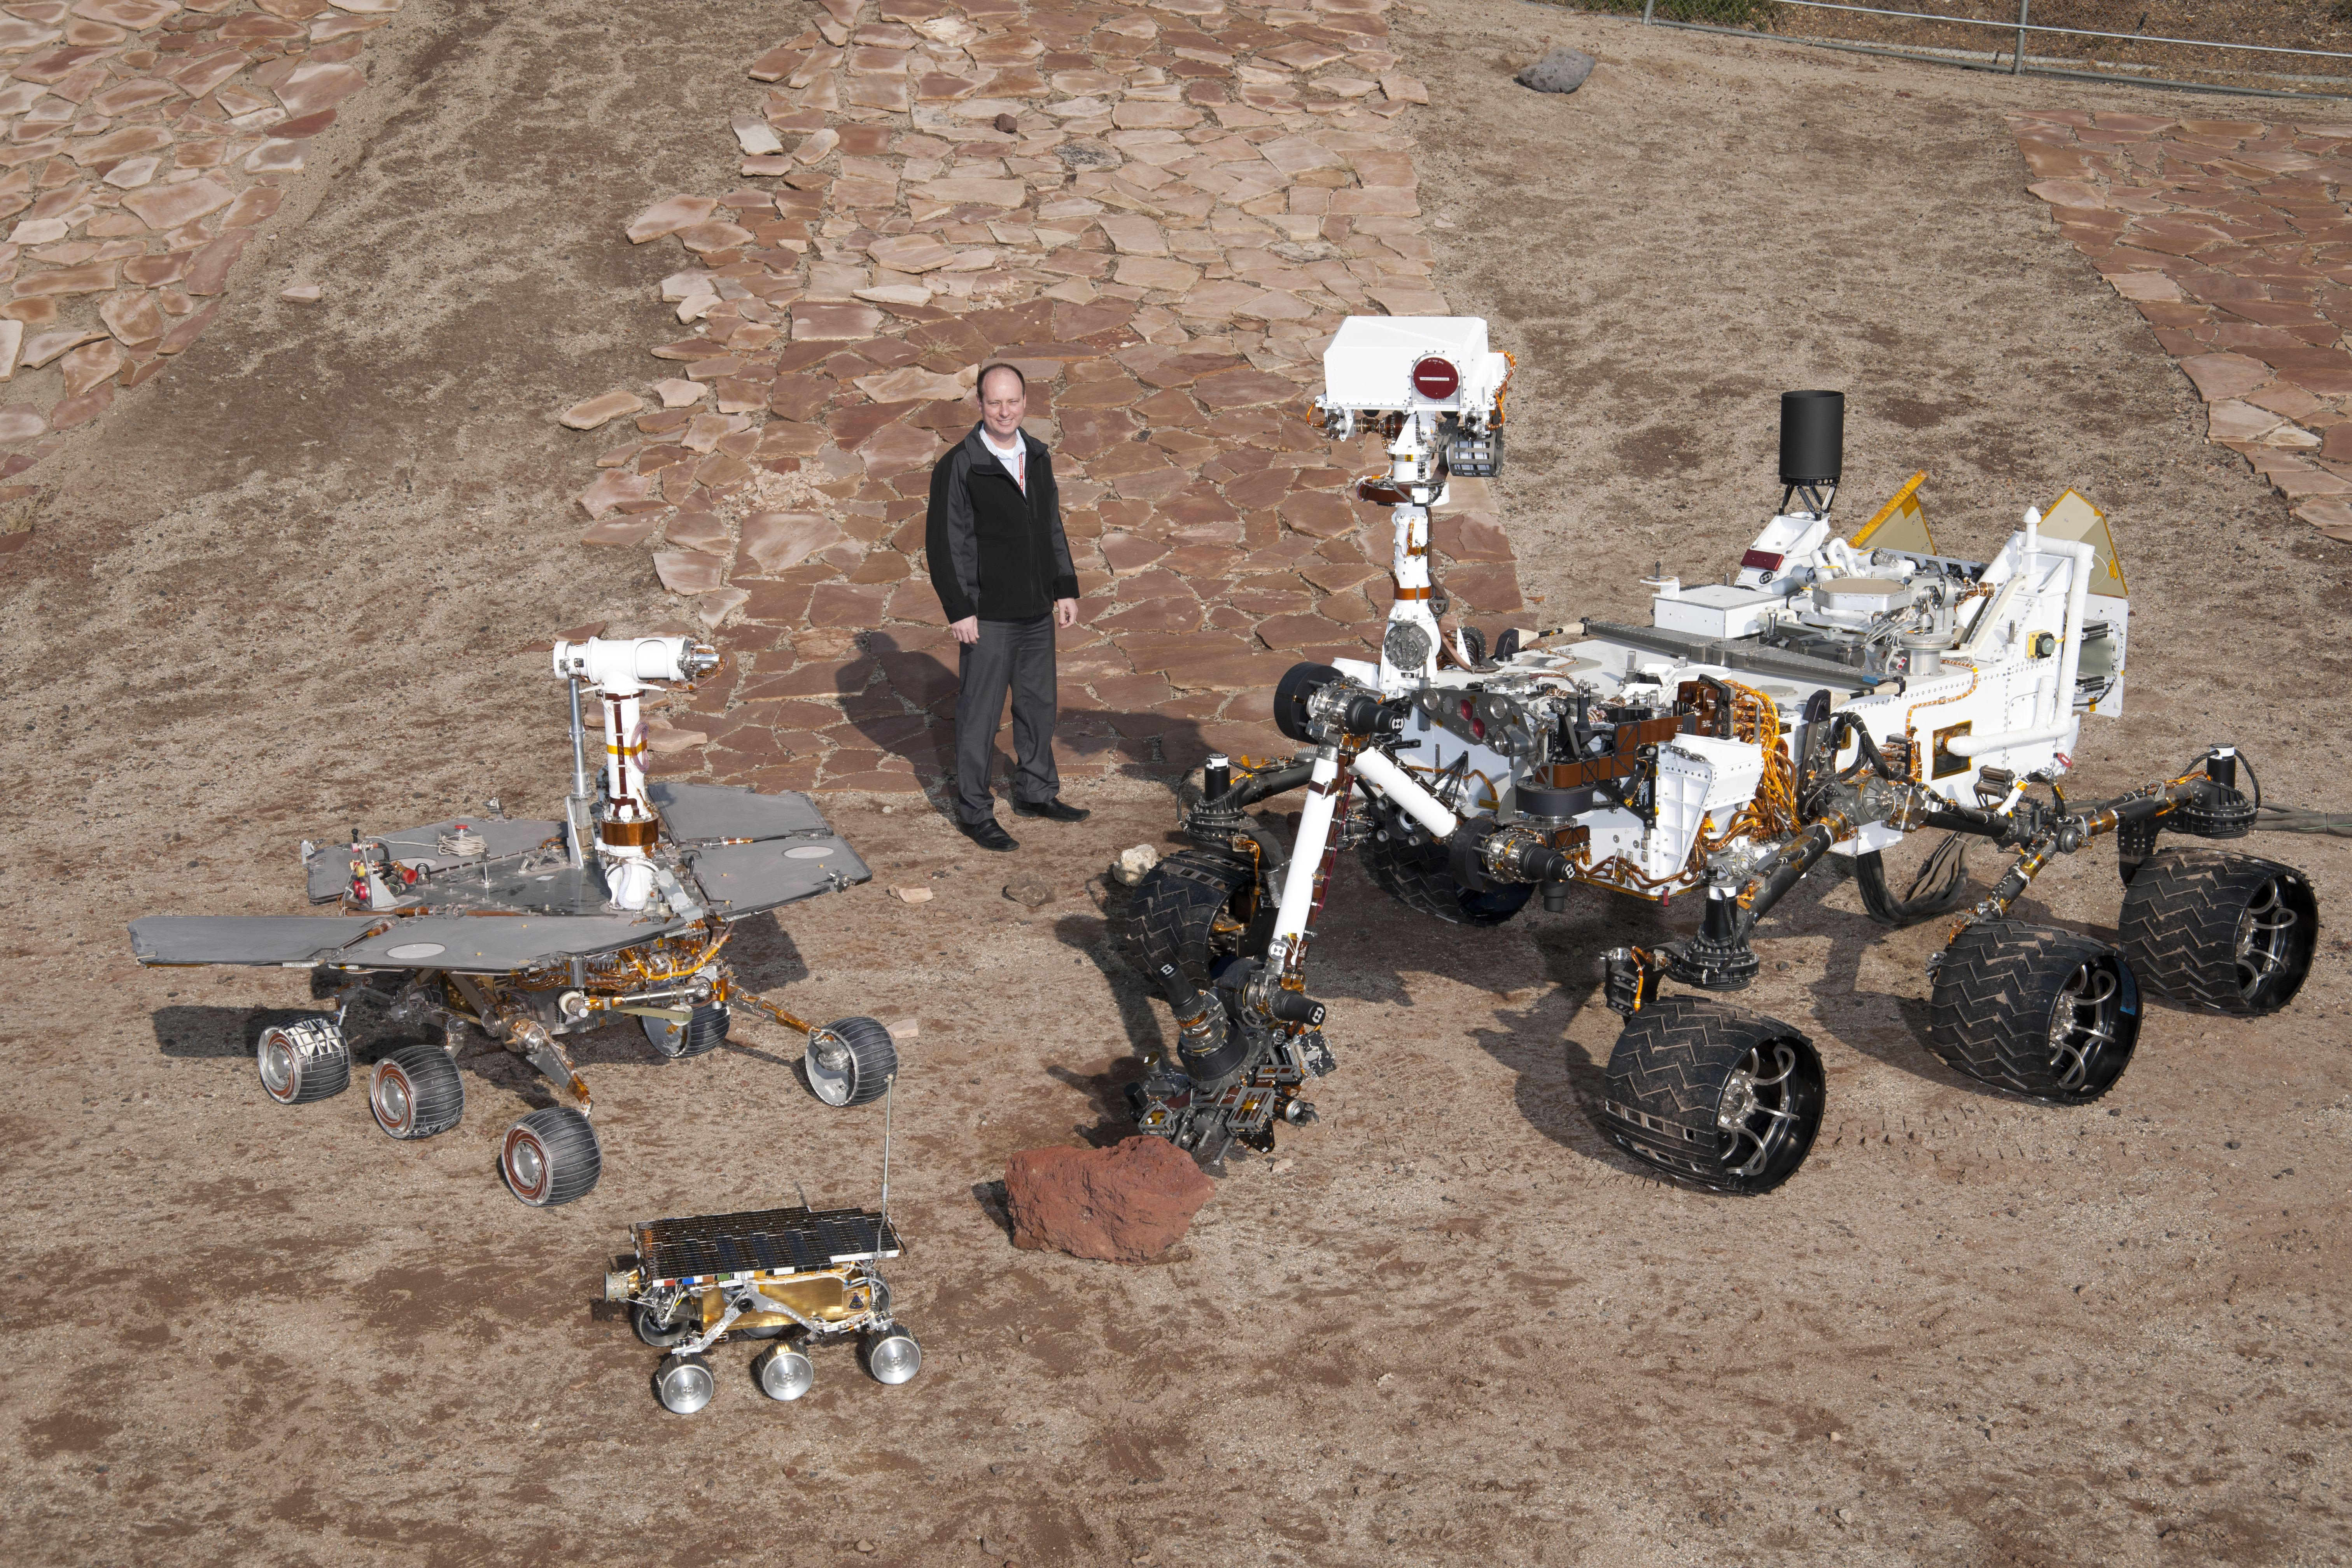 curiosity rover live feed - HD6048×4032